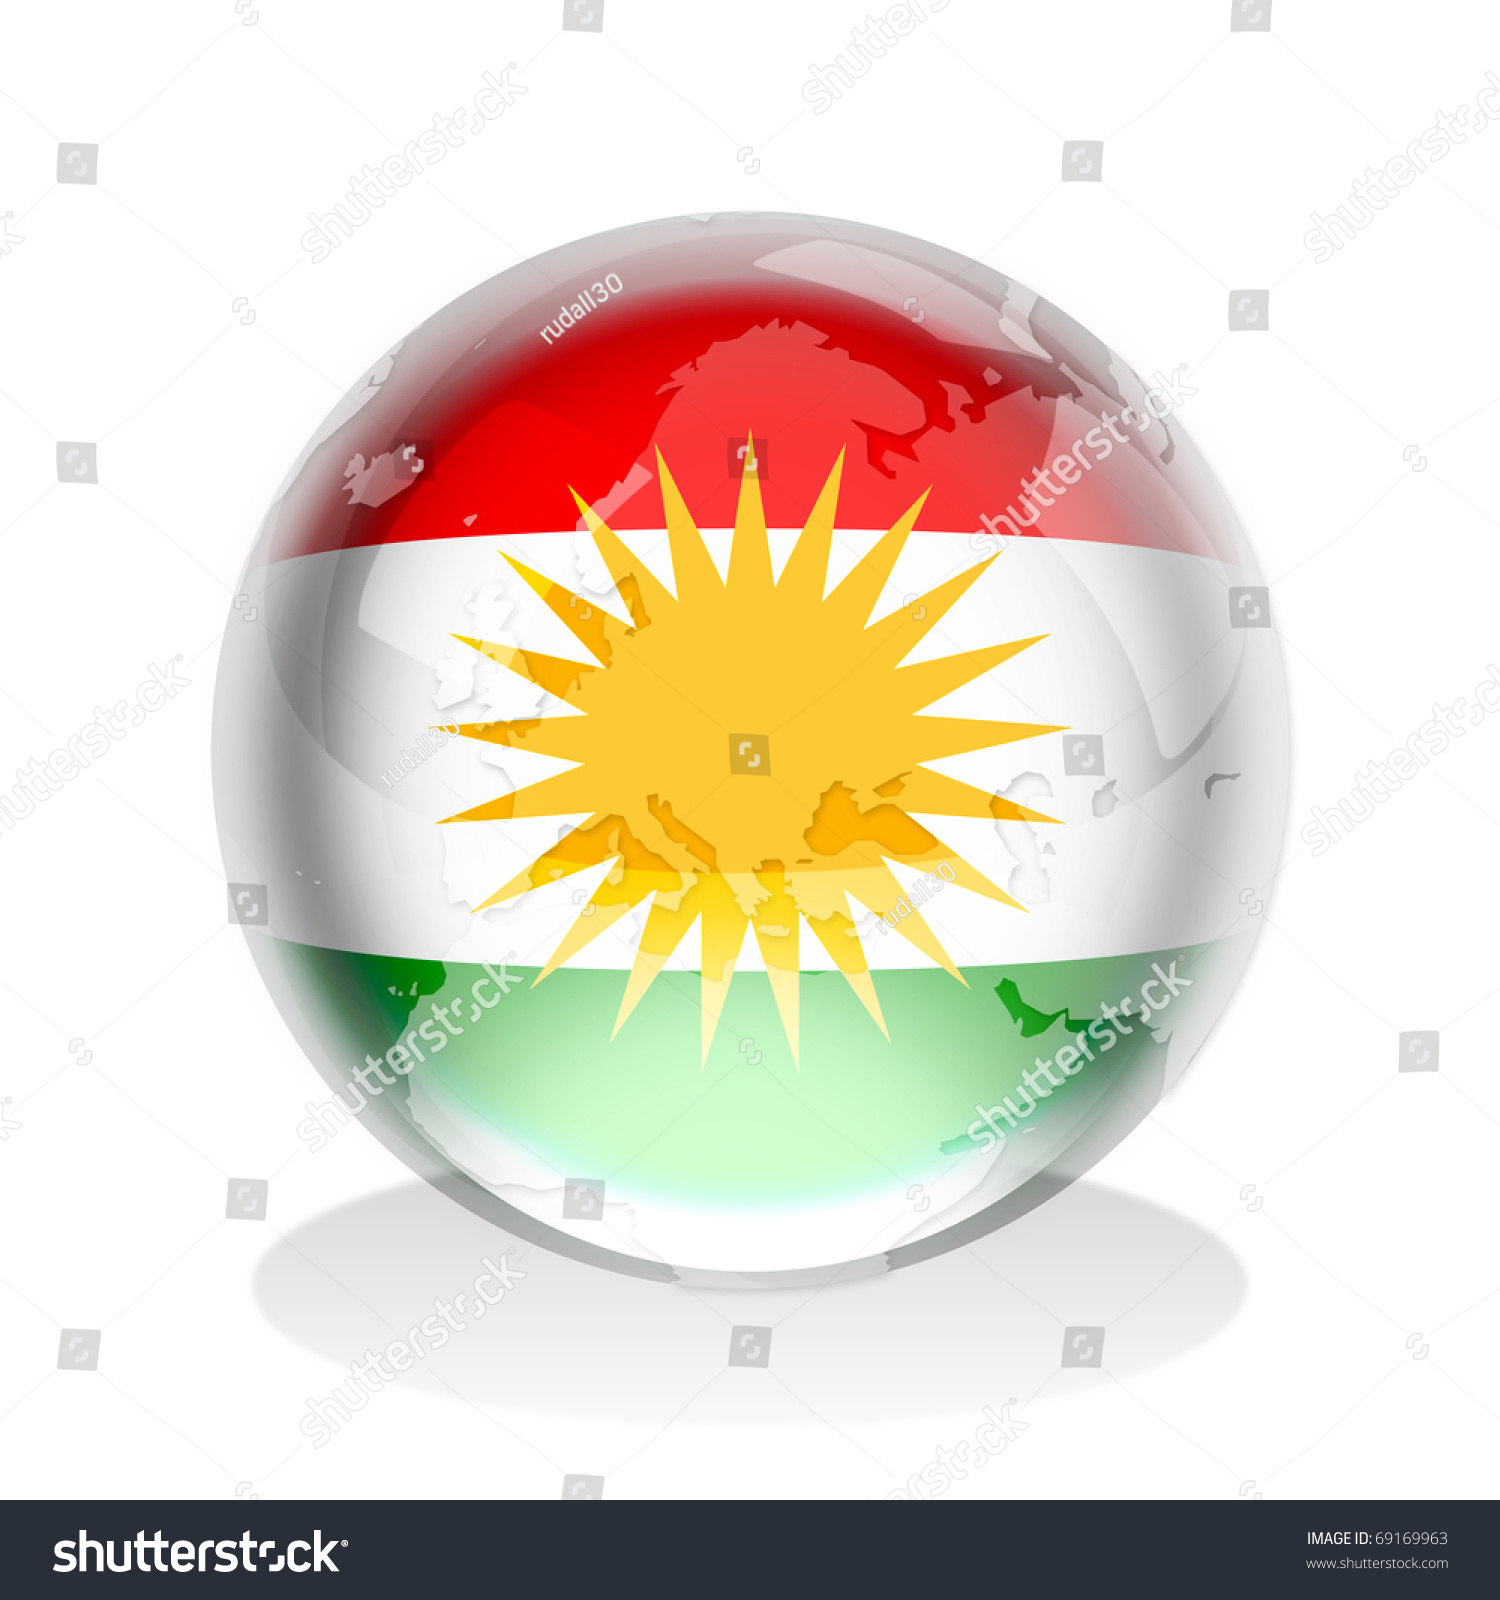 Crystal sphere kurdistan flag world map stock illustration crystal sphere kurdistan flag world map stock illustration 69169963 shutterstock gumiabroncs Choice Image